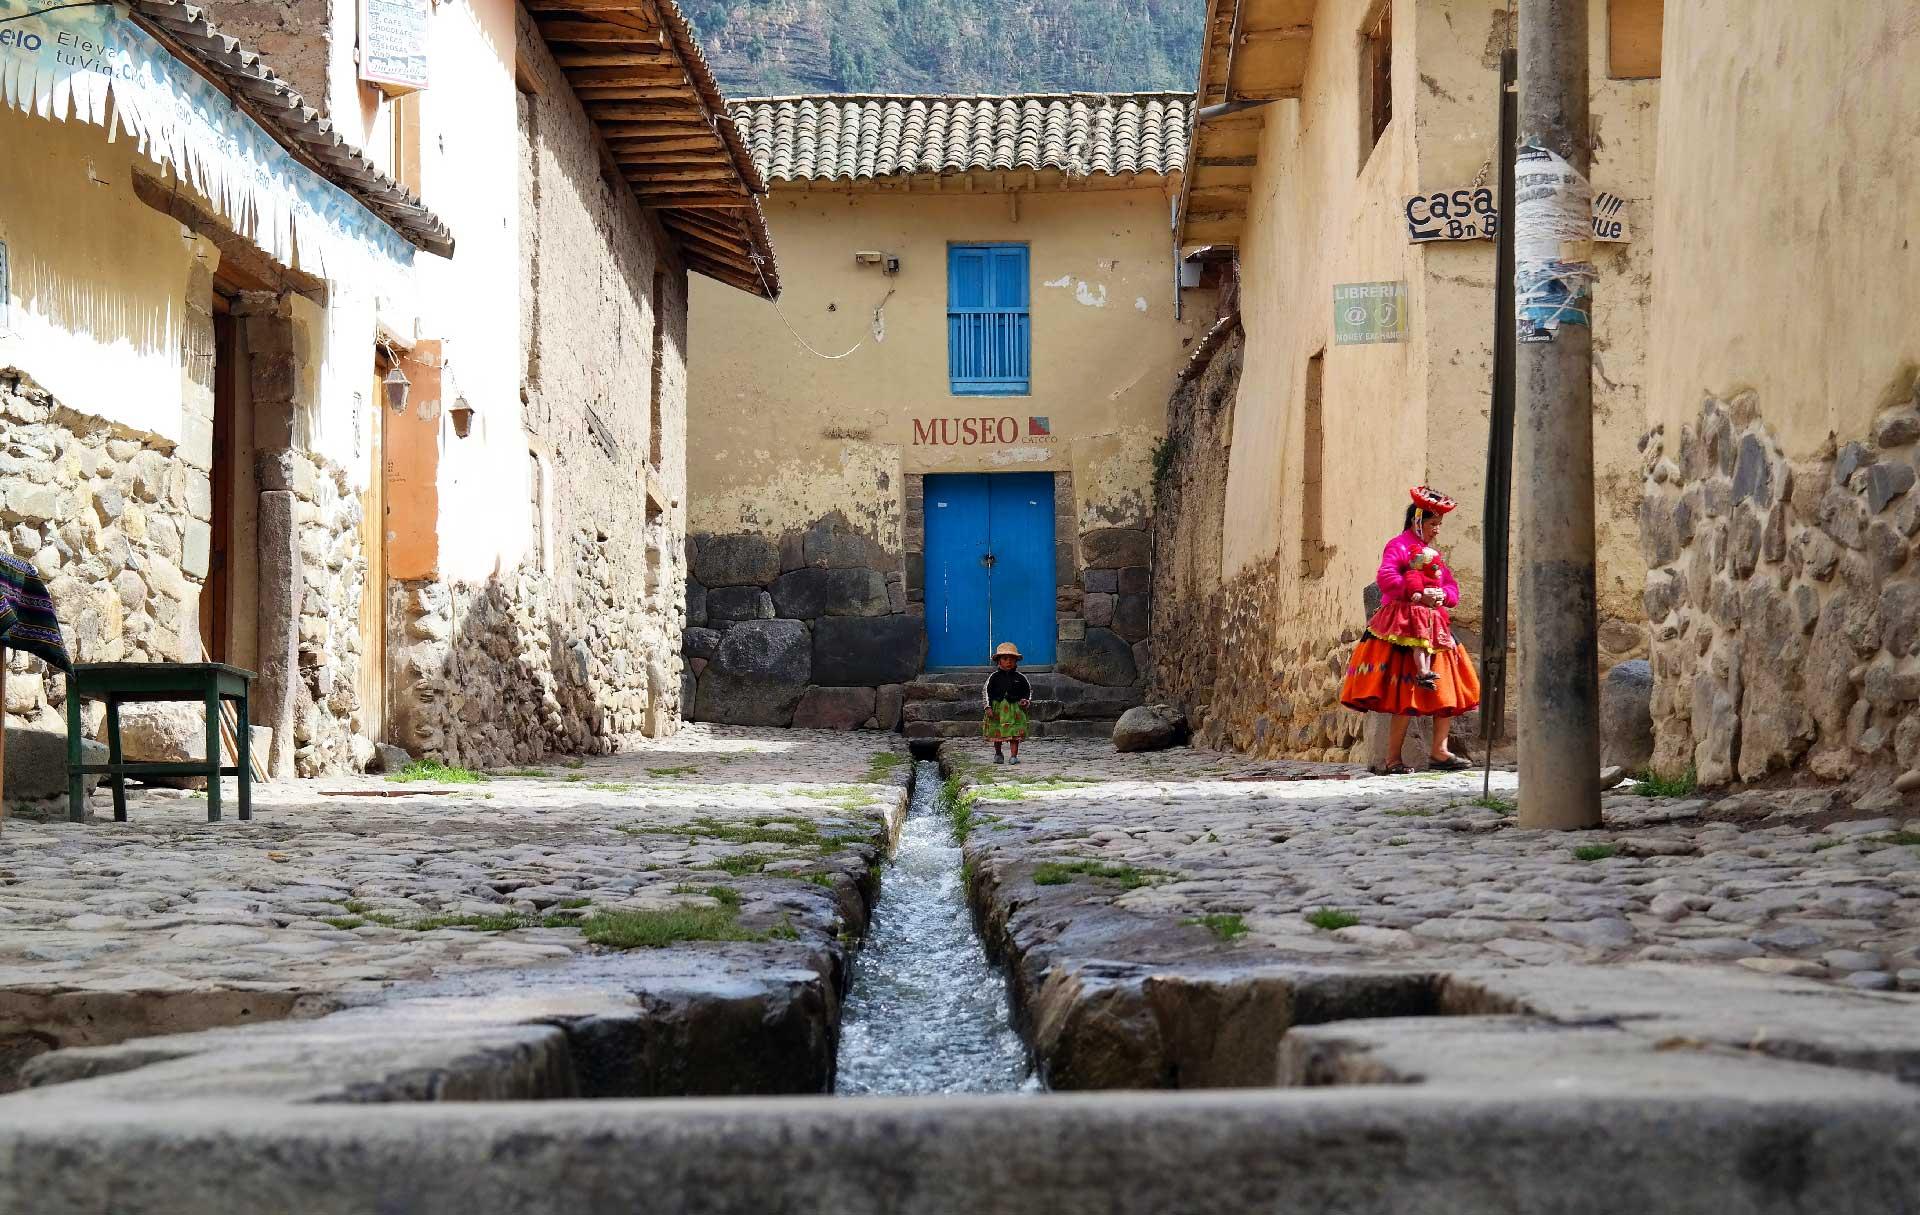 PERU_ValleeSagrado_Ollantaytambo7_Schindele_2014-web